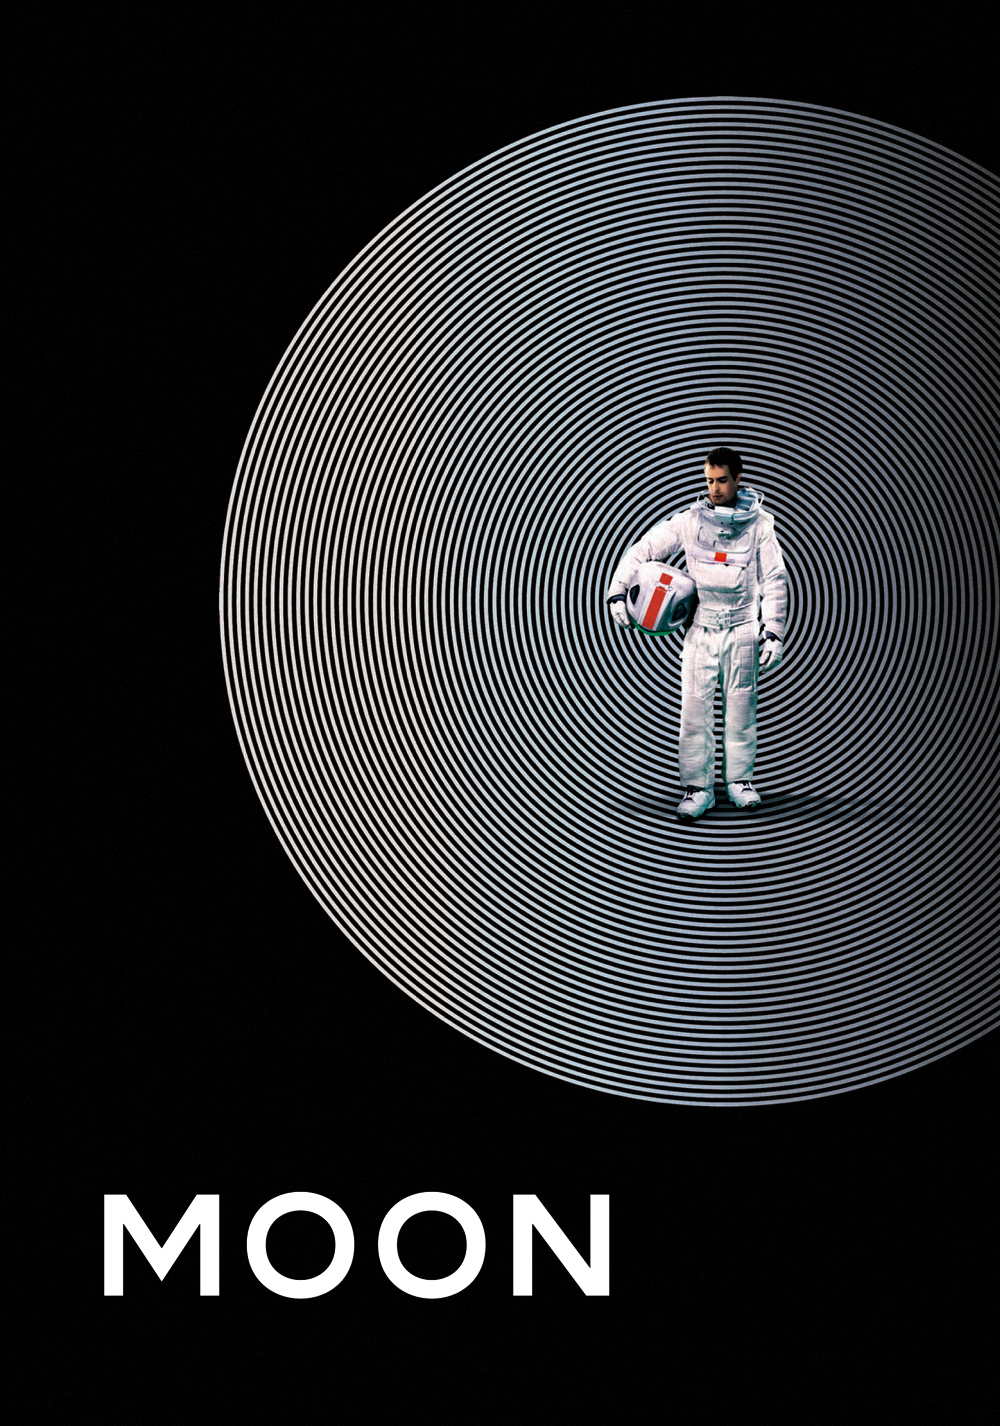 Moon (Film)